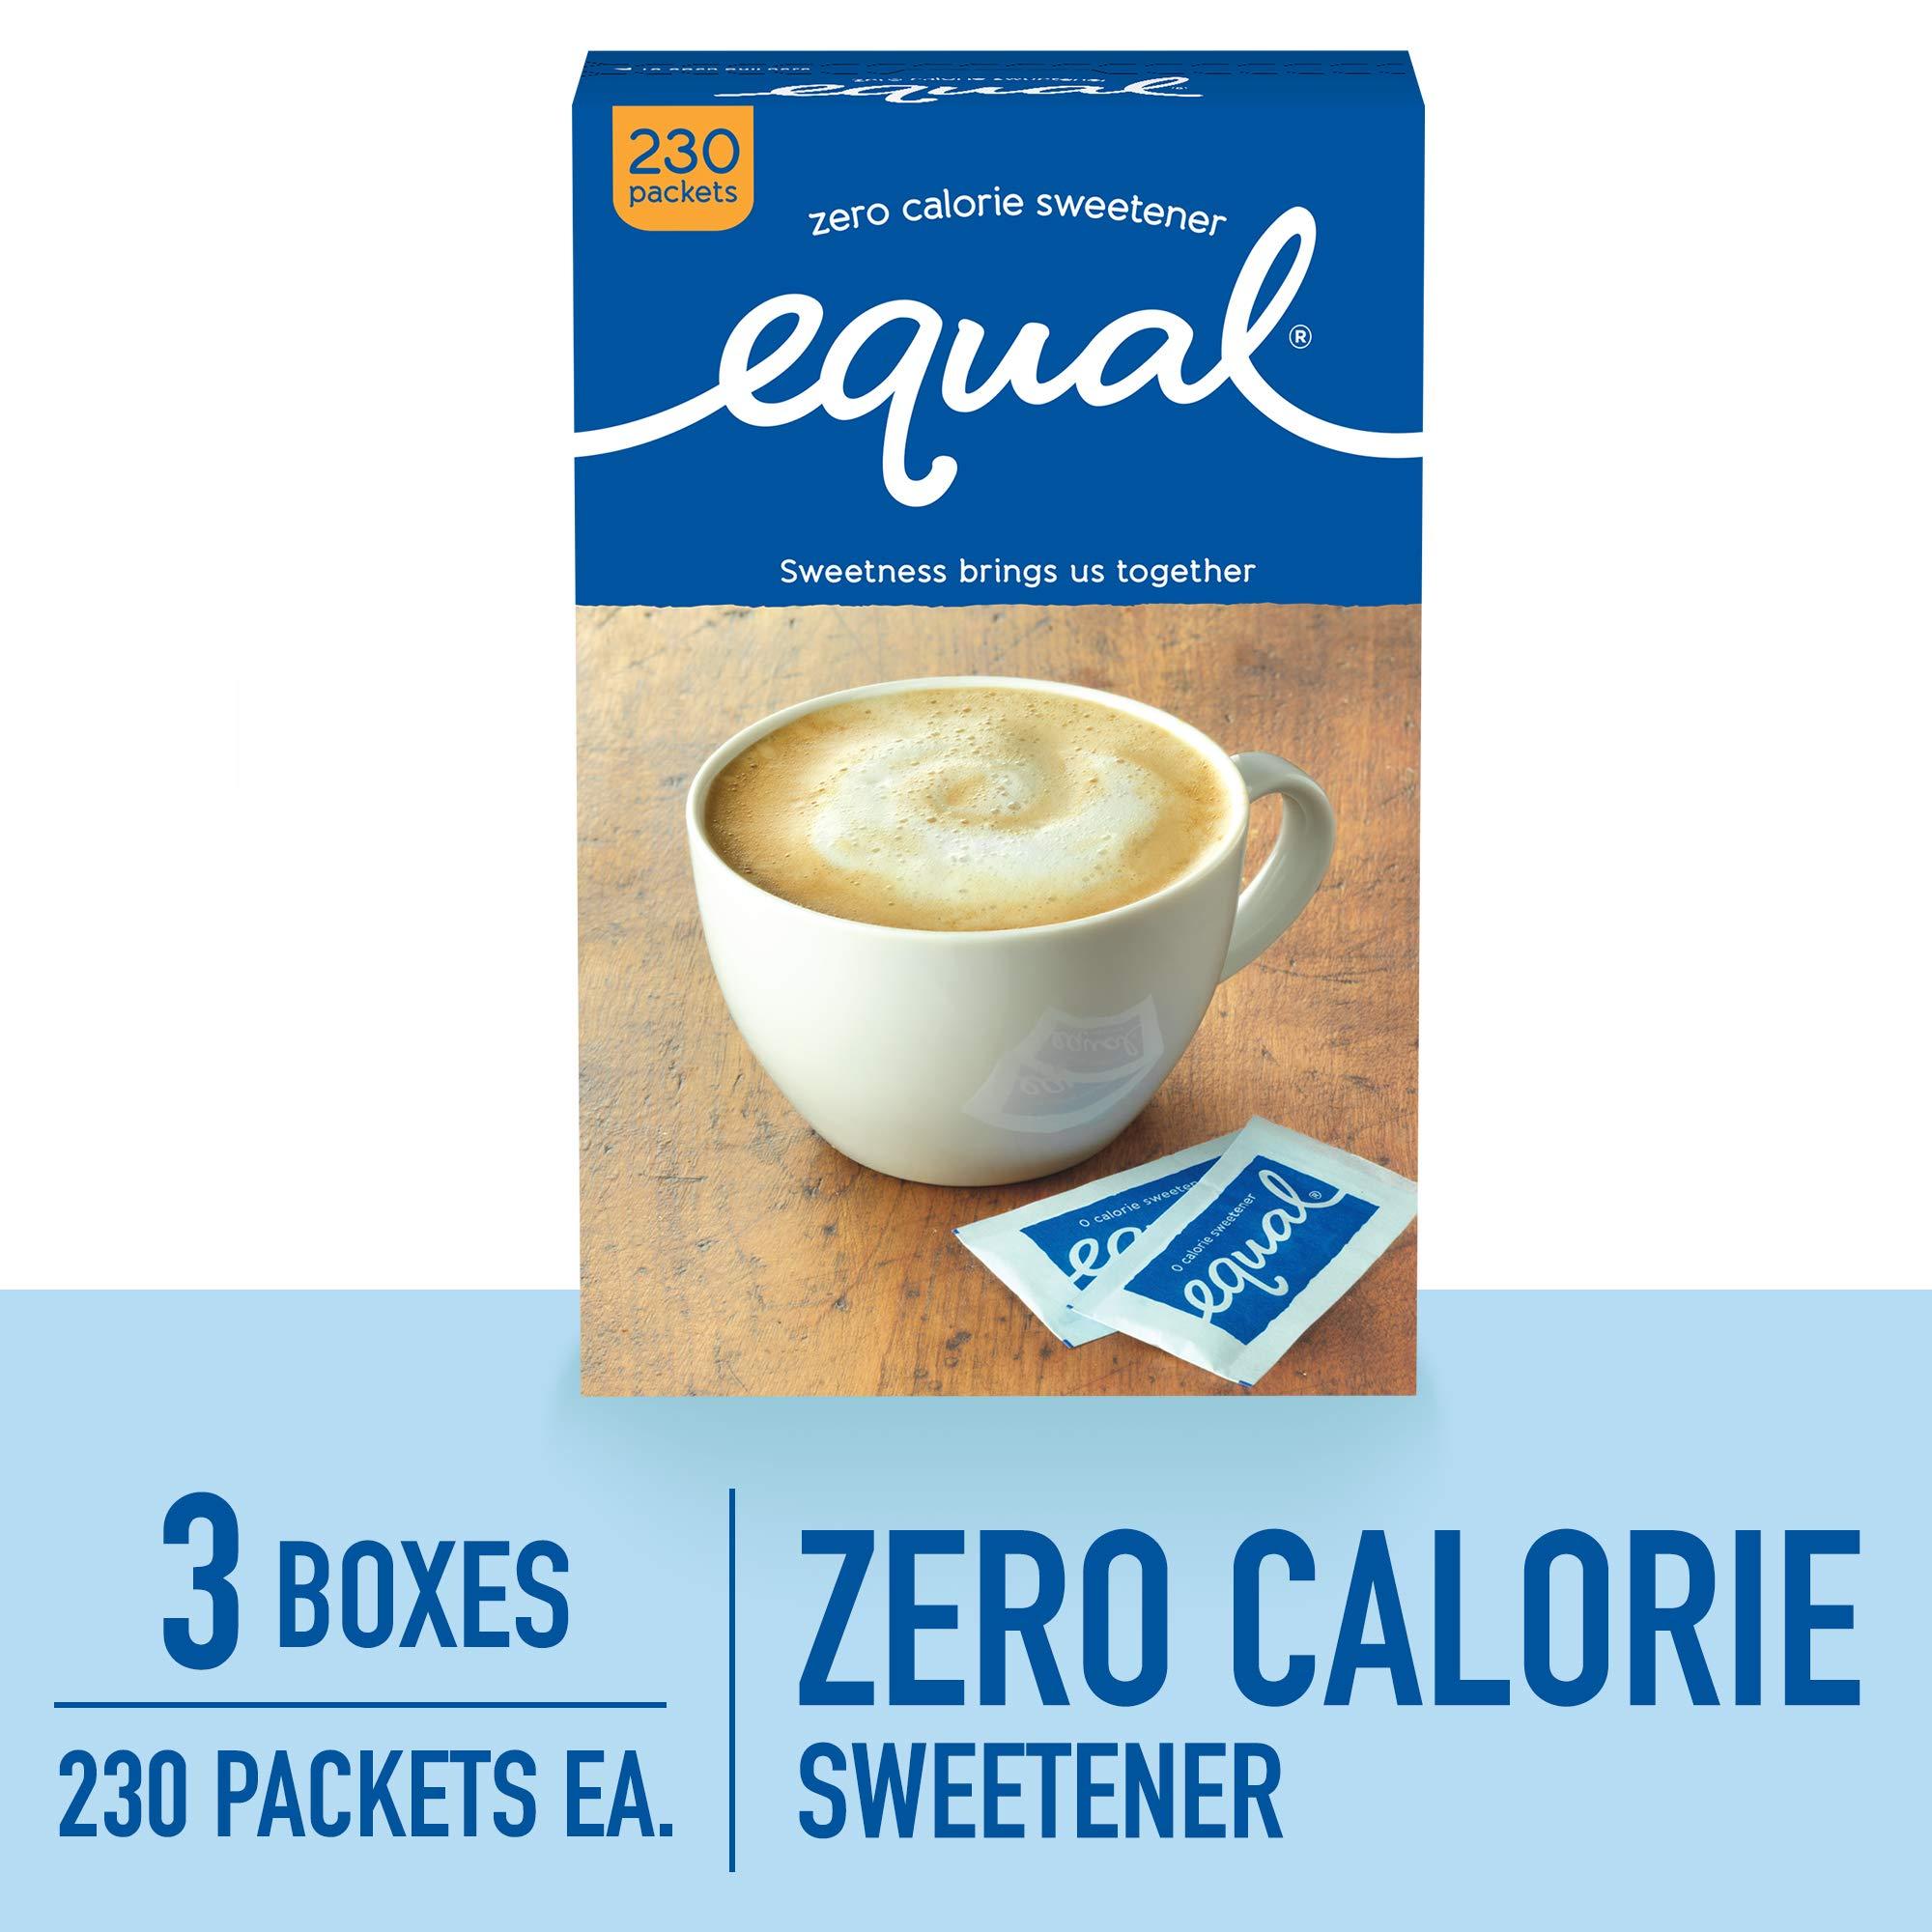 EQUAL 0 Calorie Sweetener, Sugar Substitute, Zero Calorie Sugar Alternative Sweetener Packets, Sugar Alternative, 230 Count (Pack of 3)